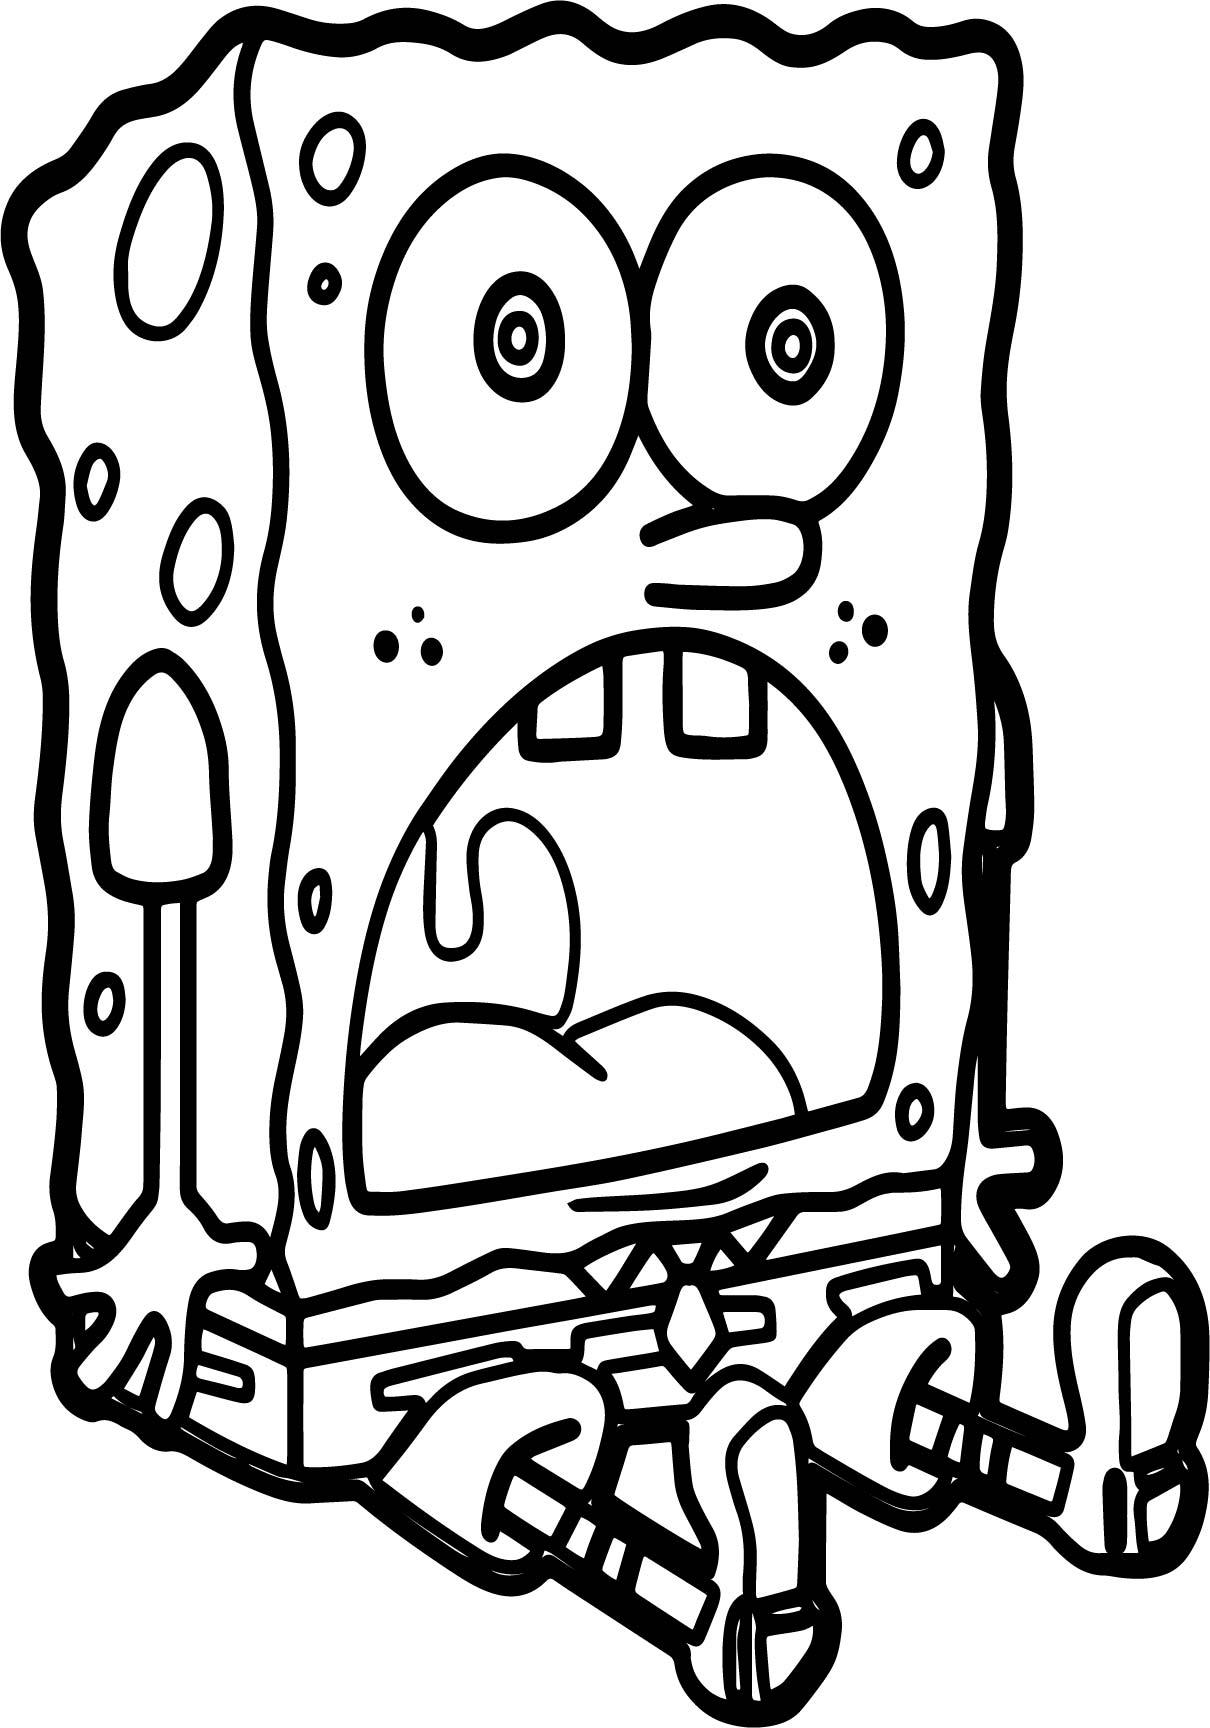 Sponge Bob Confused Coloring Page